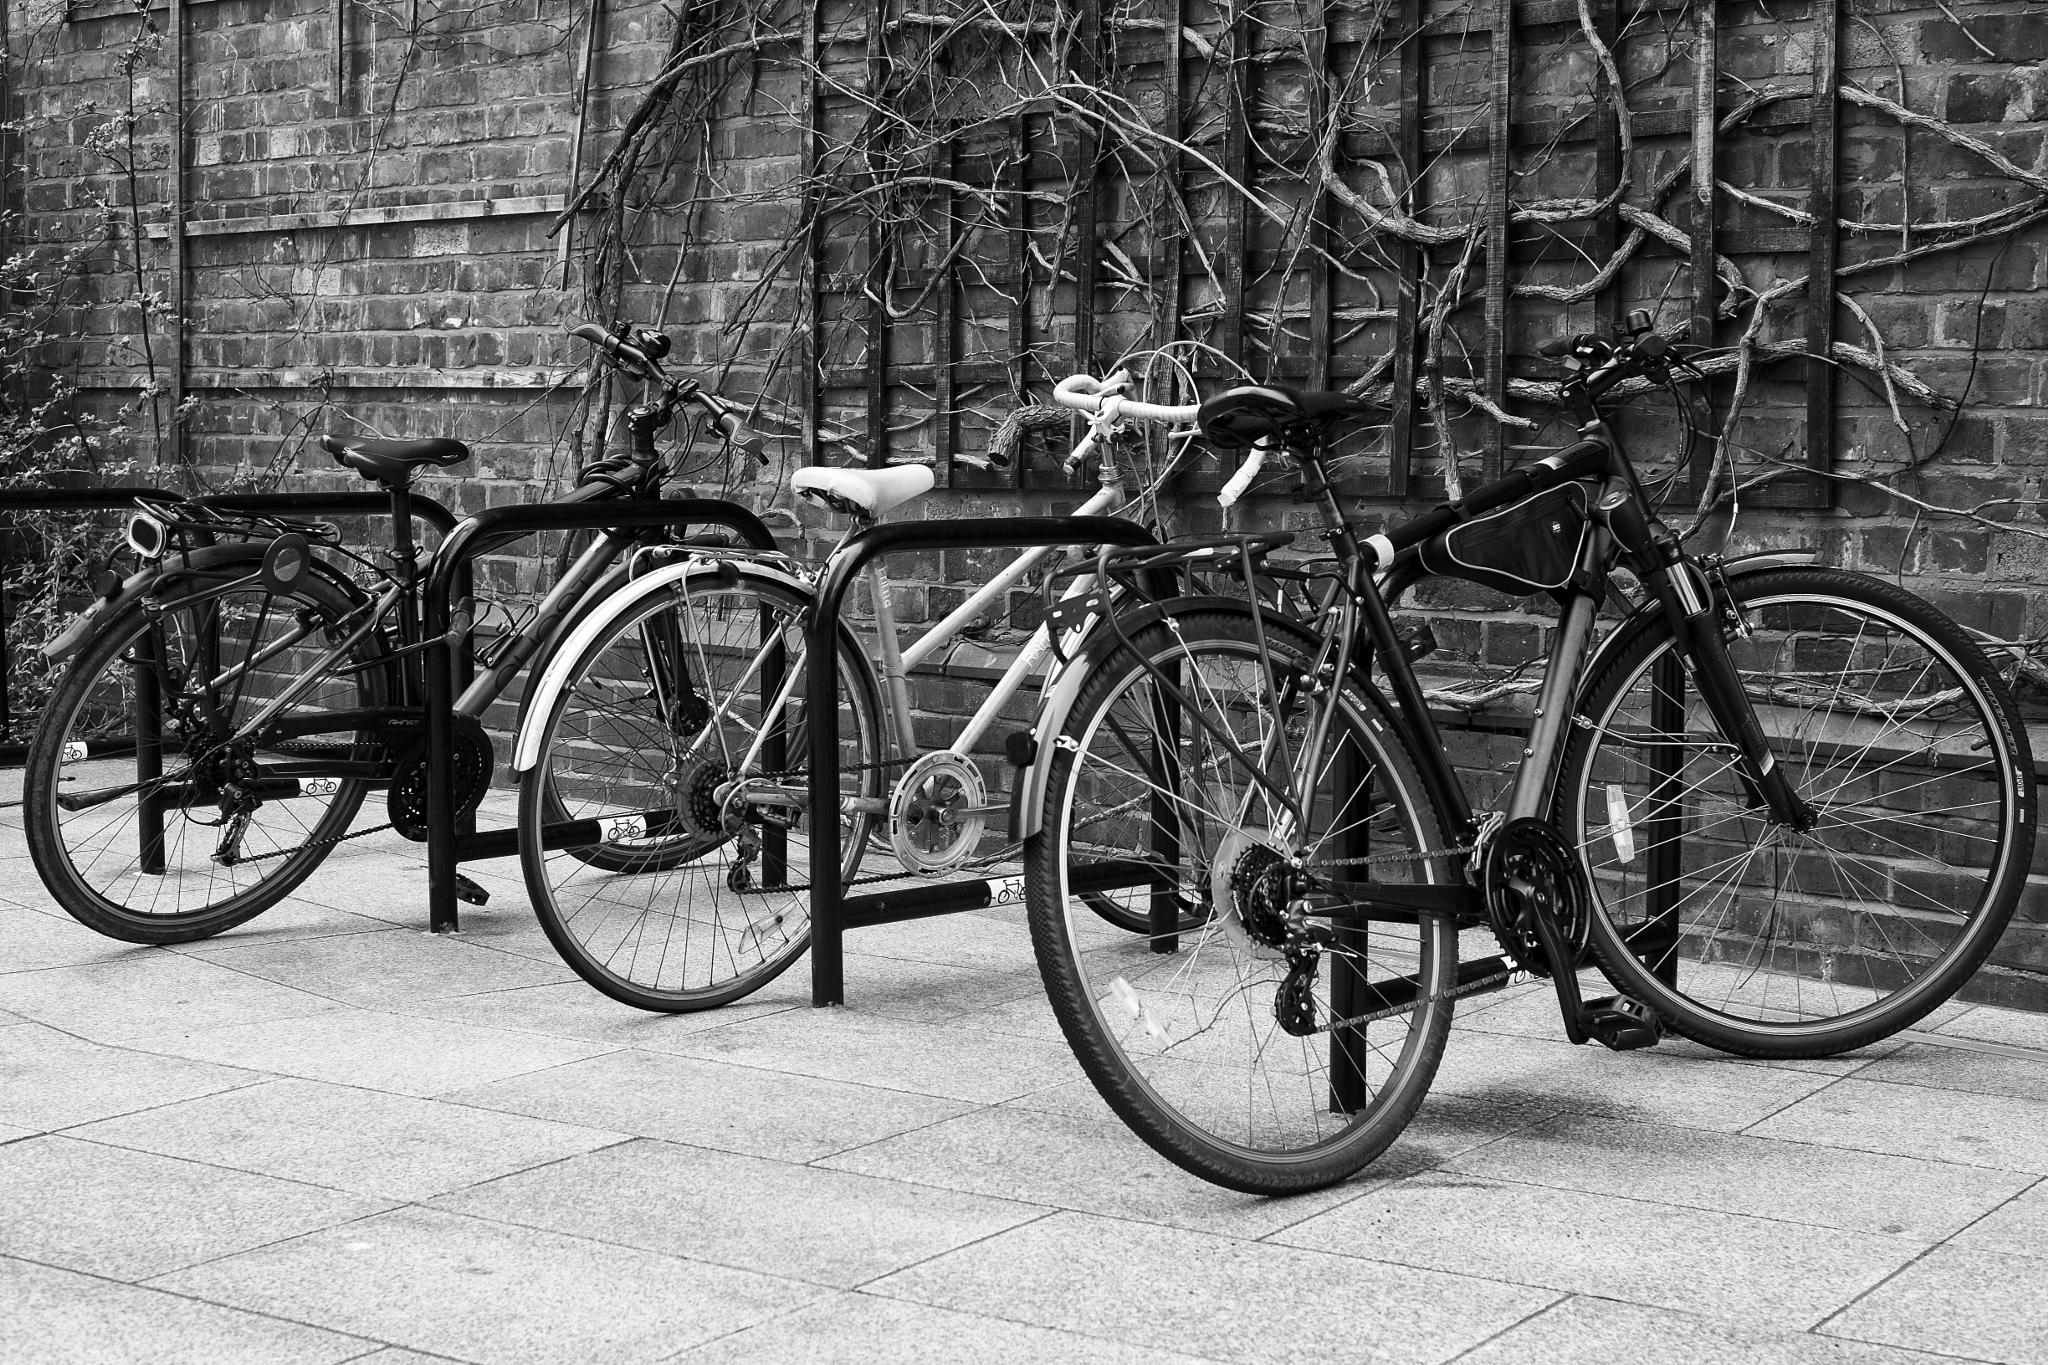 Bike Park by Martin Beecroft